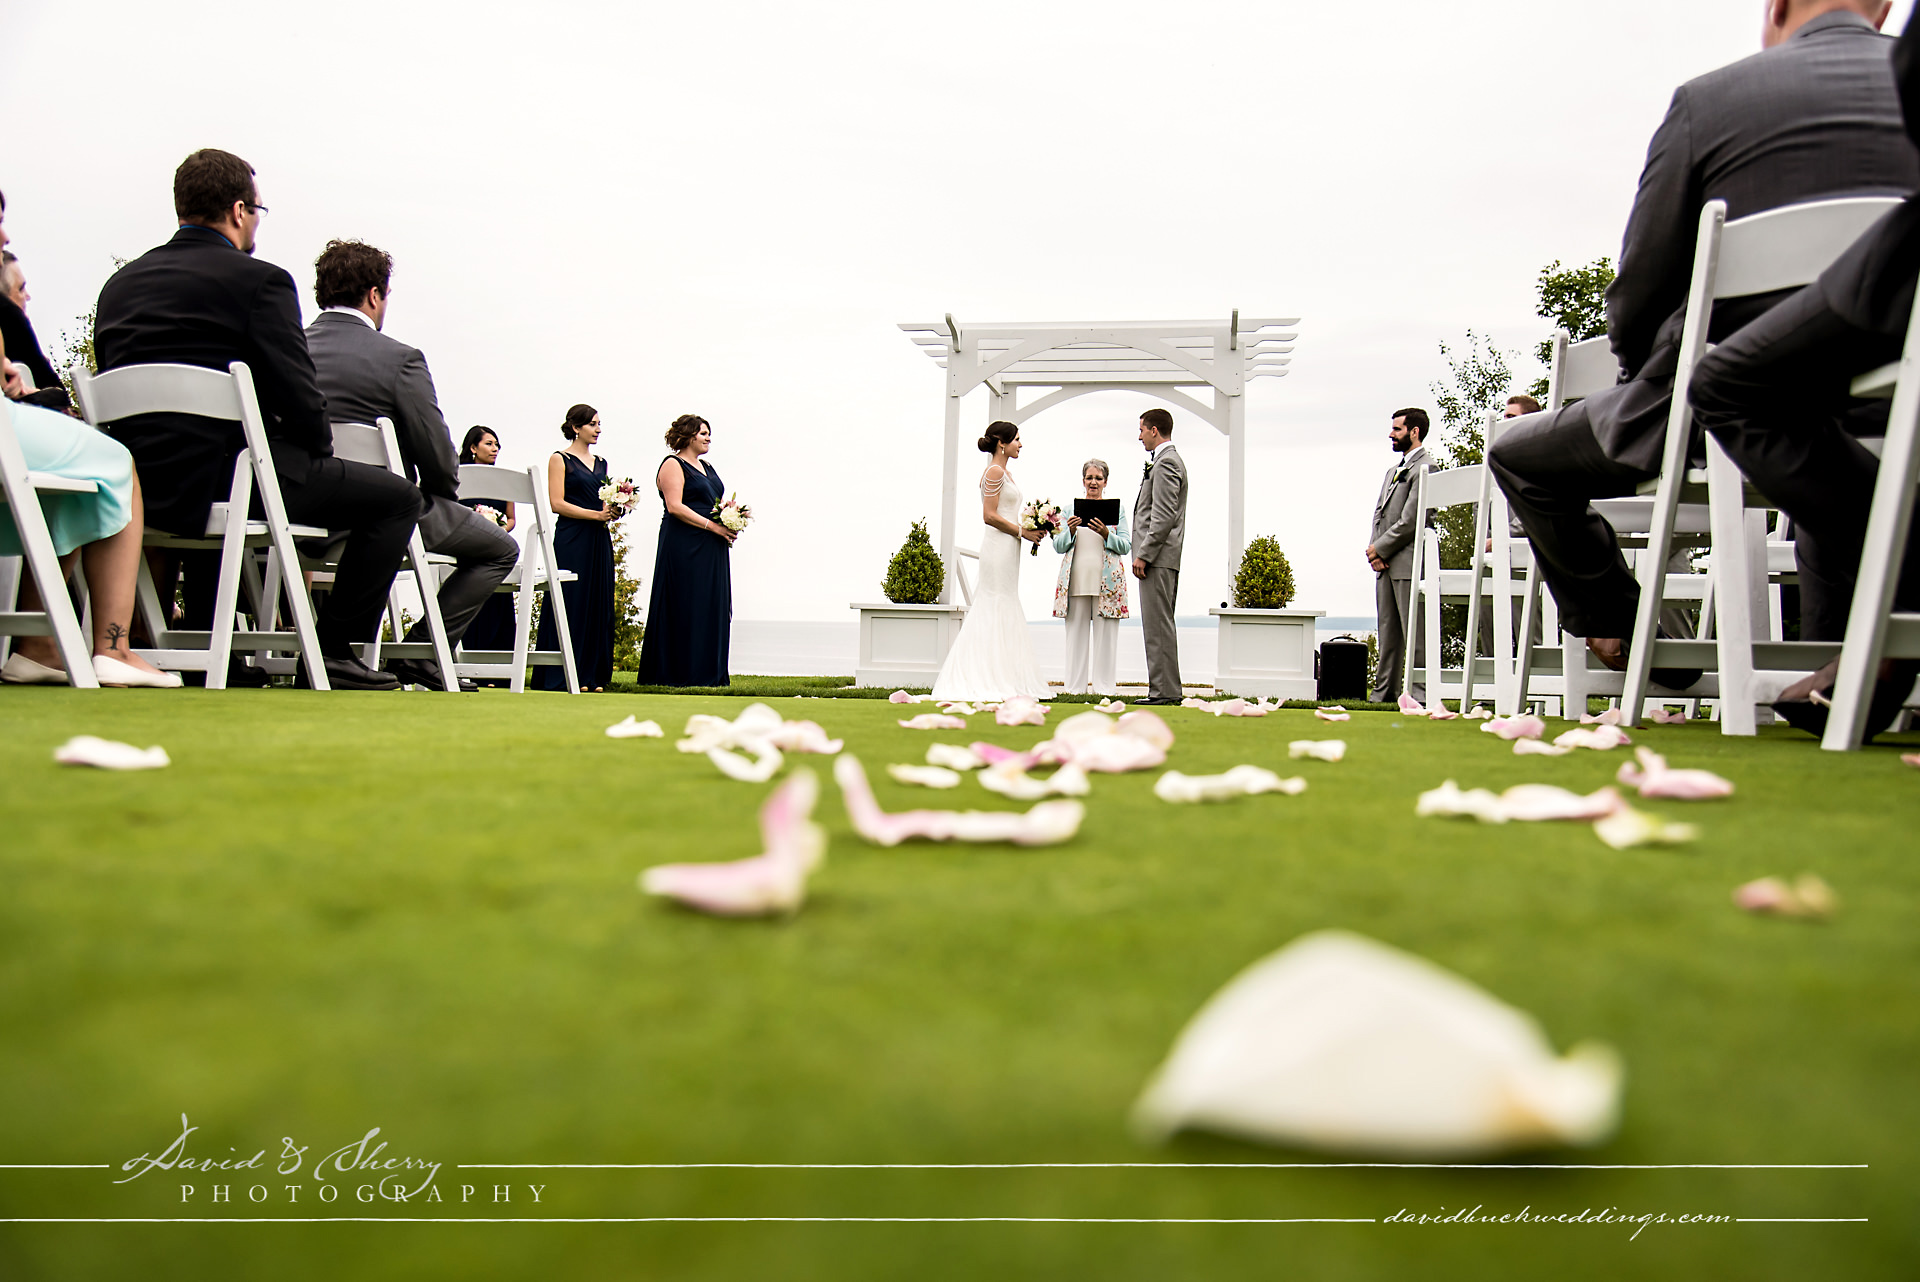 Cobble_Beach_Wedding_Photography_021